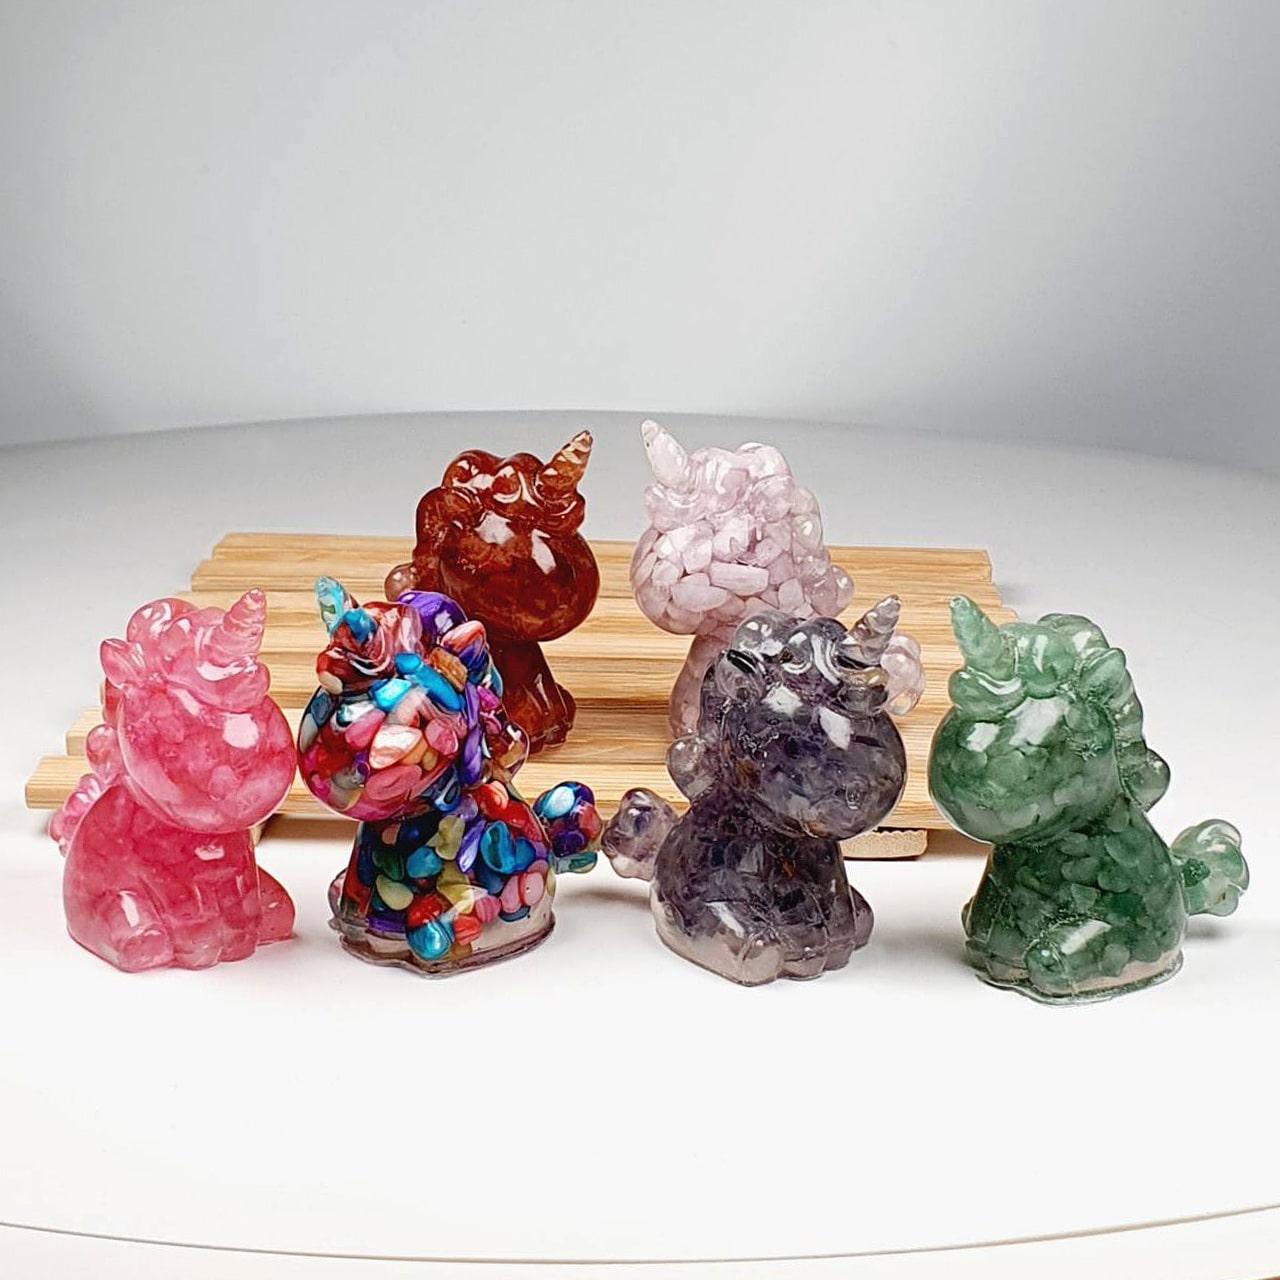 Unicorn Crystal Decoration - All Types